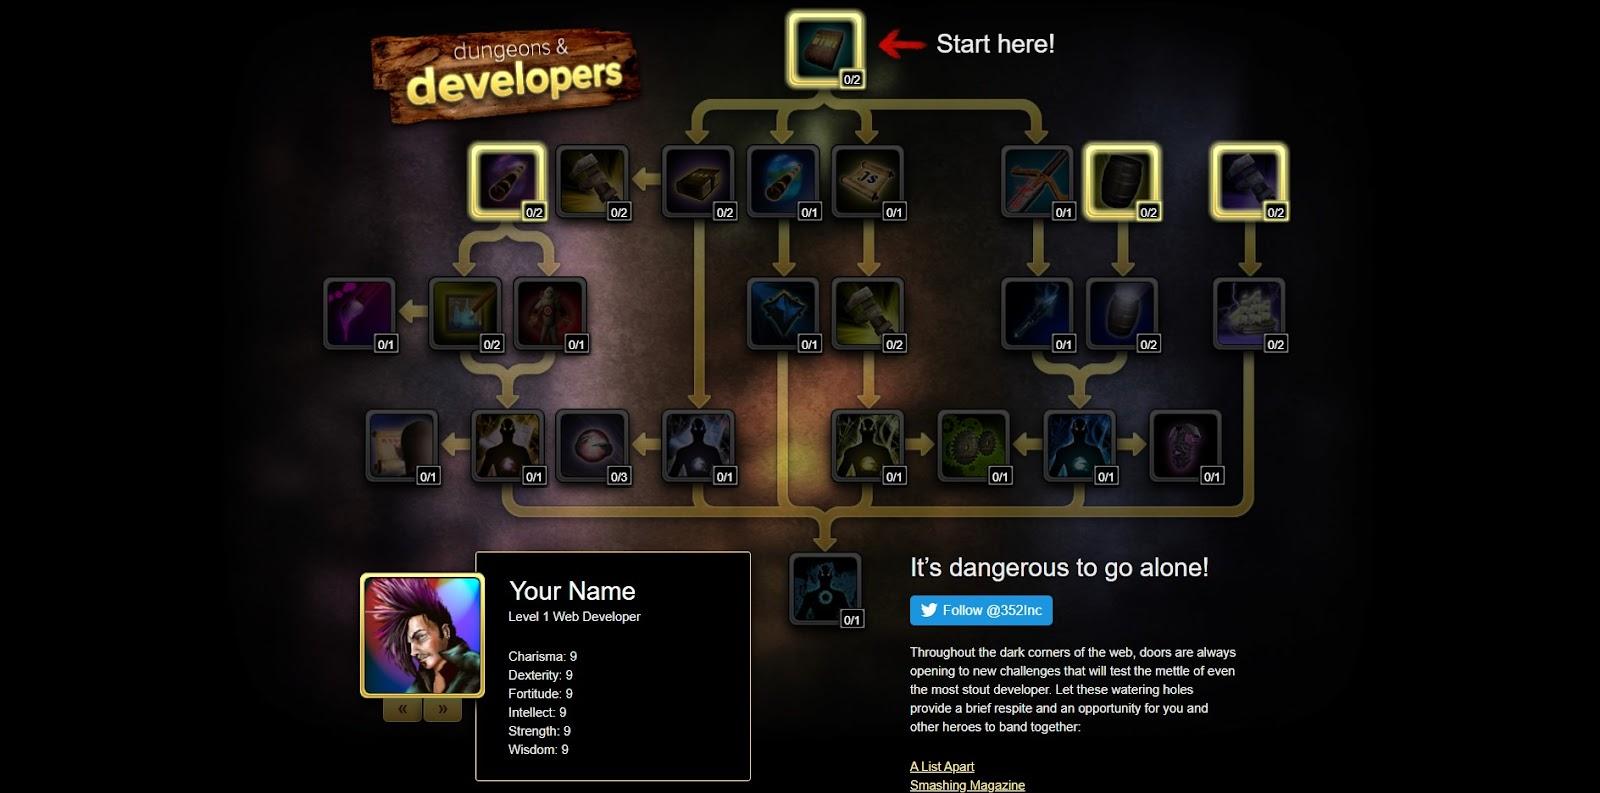 Скриншот игры Dungeons &Developers